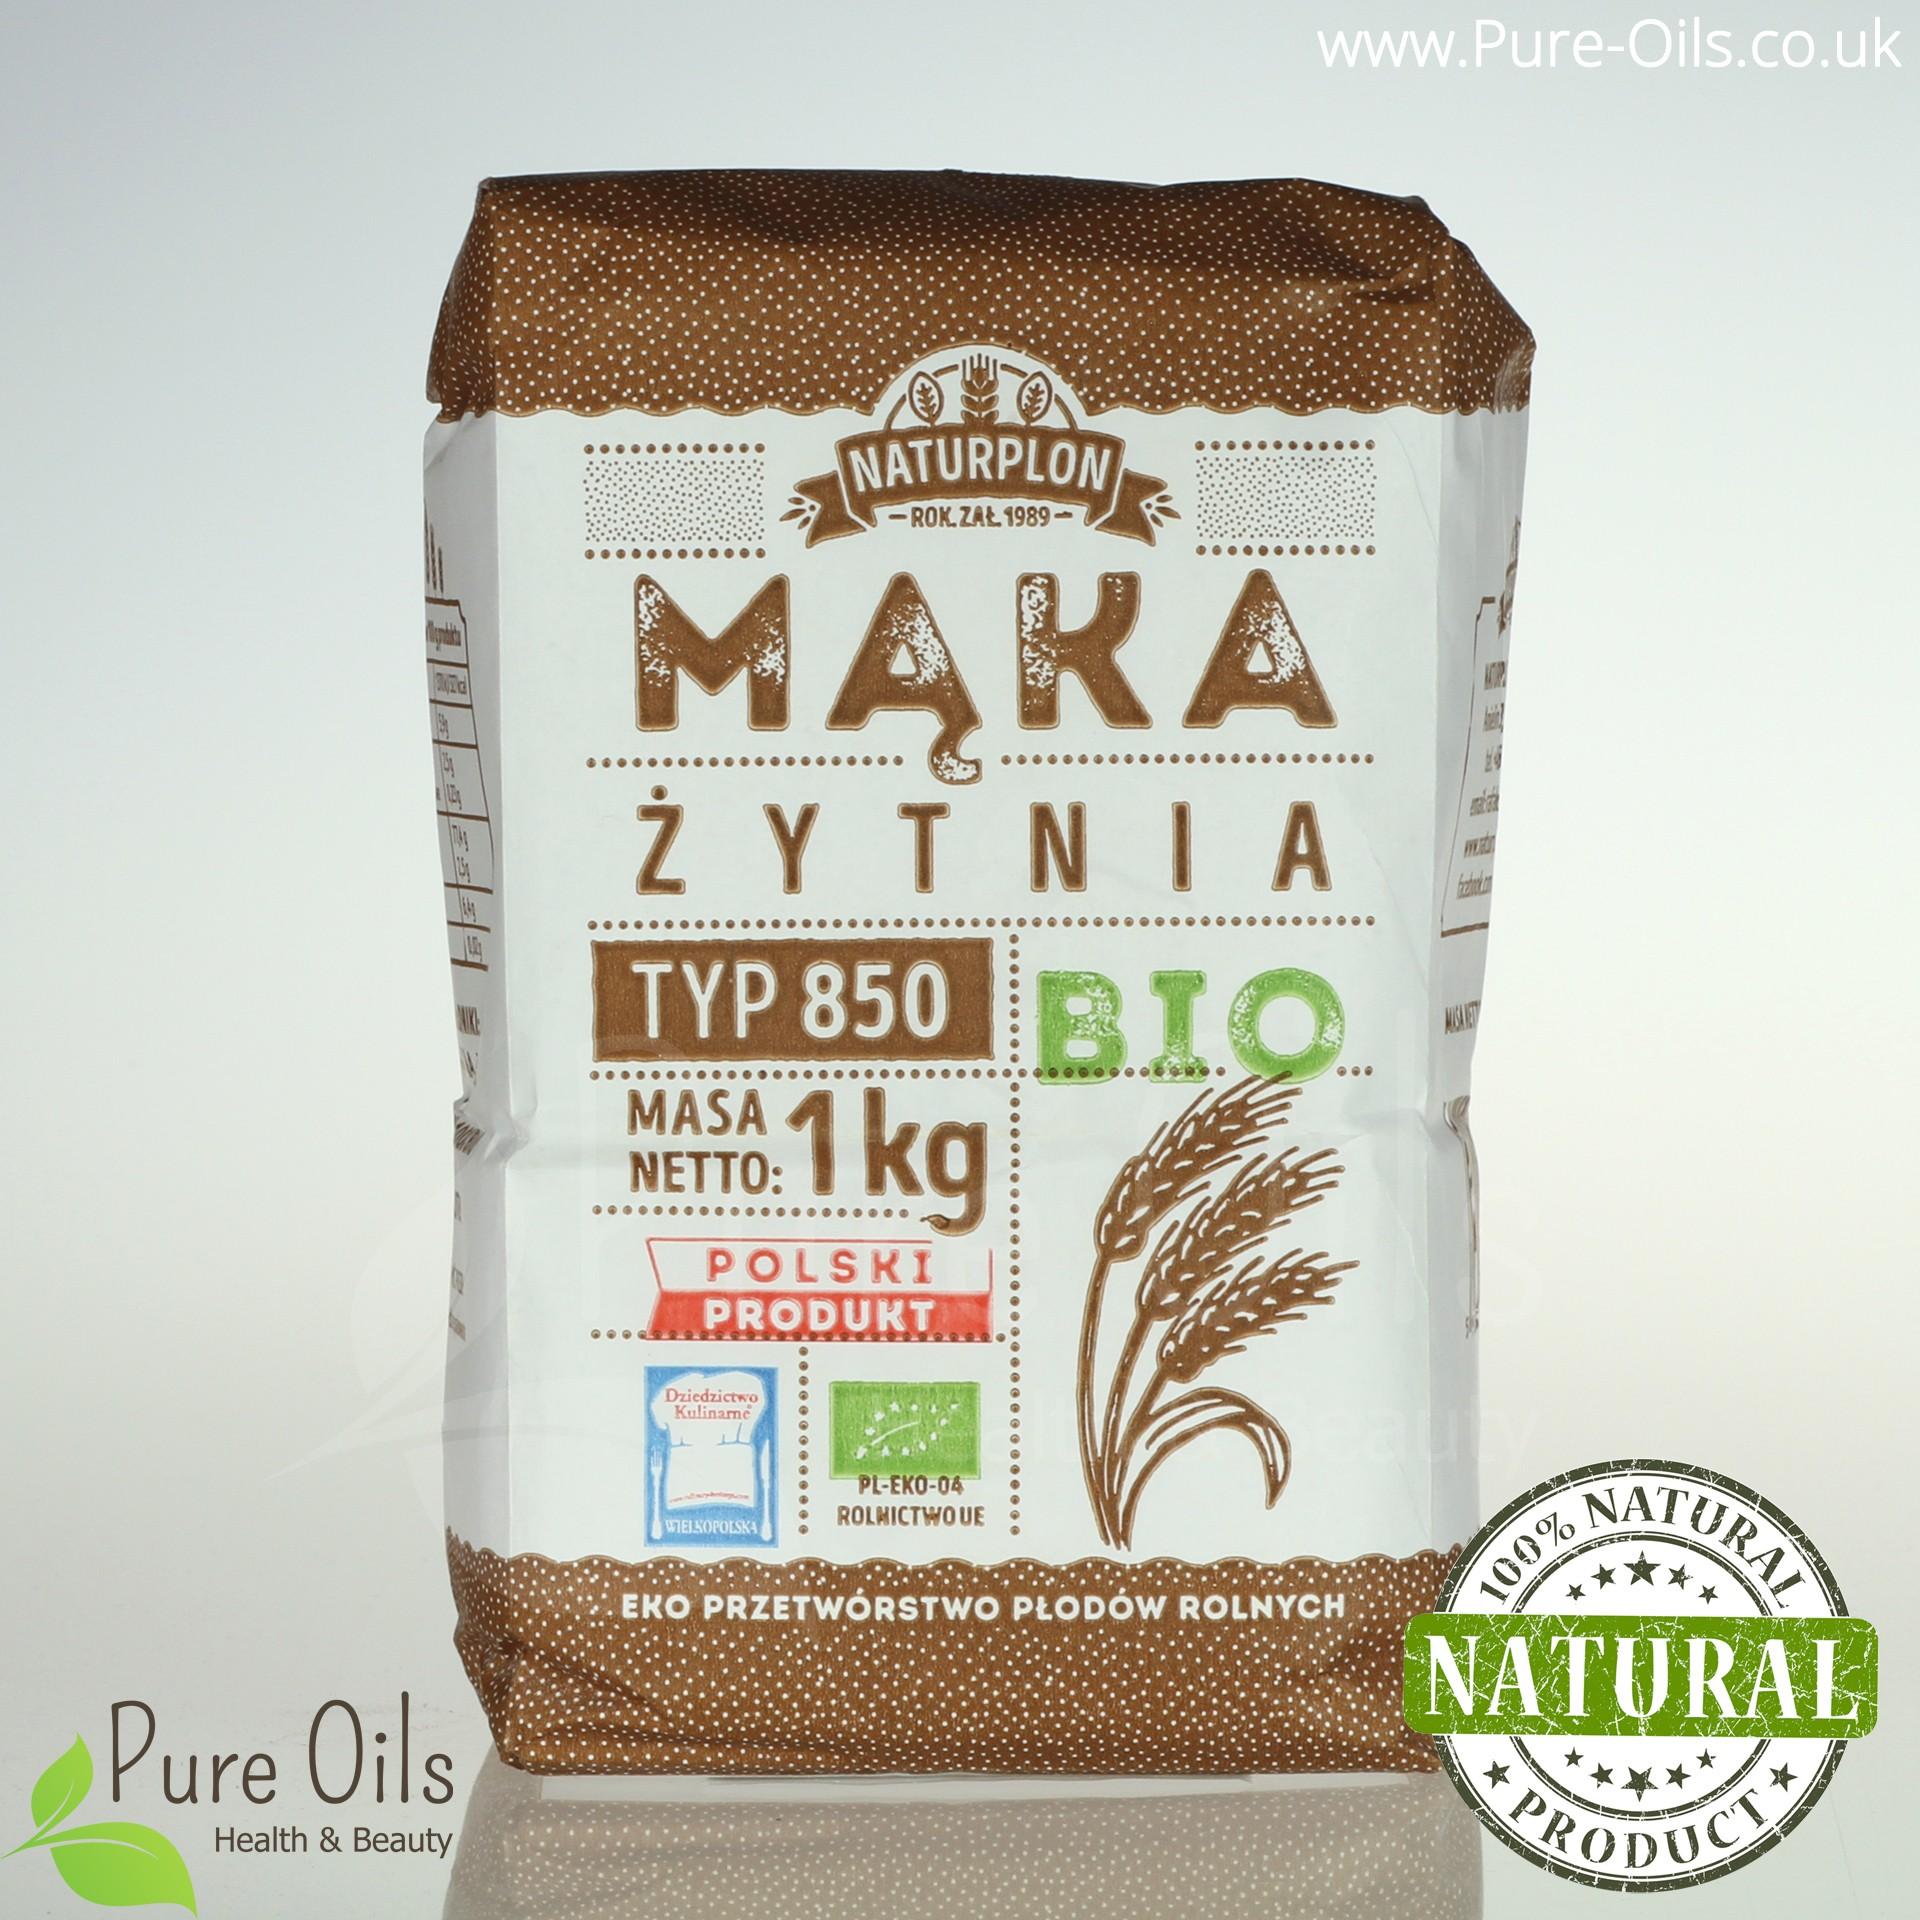 Mąka Żytnia, Typ 850 - Bio, Naturplon